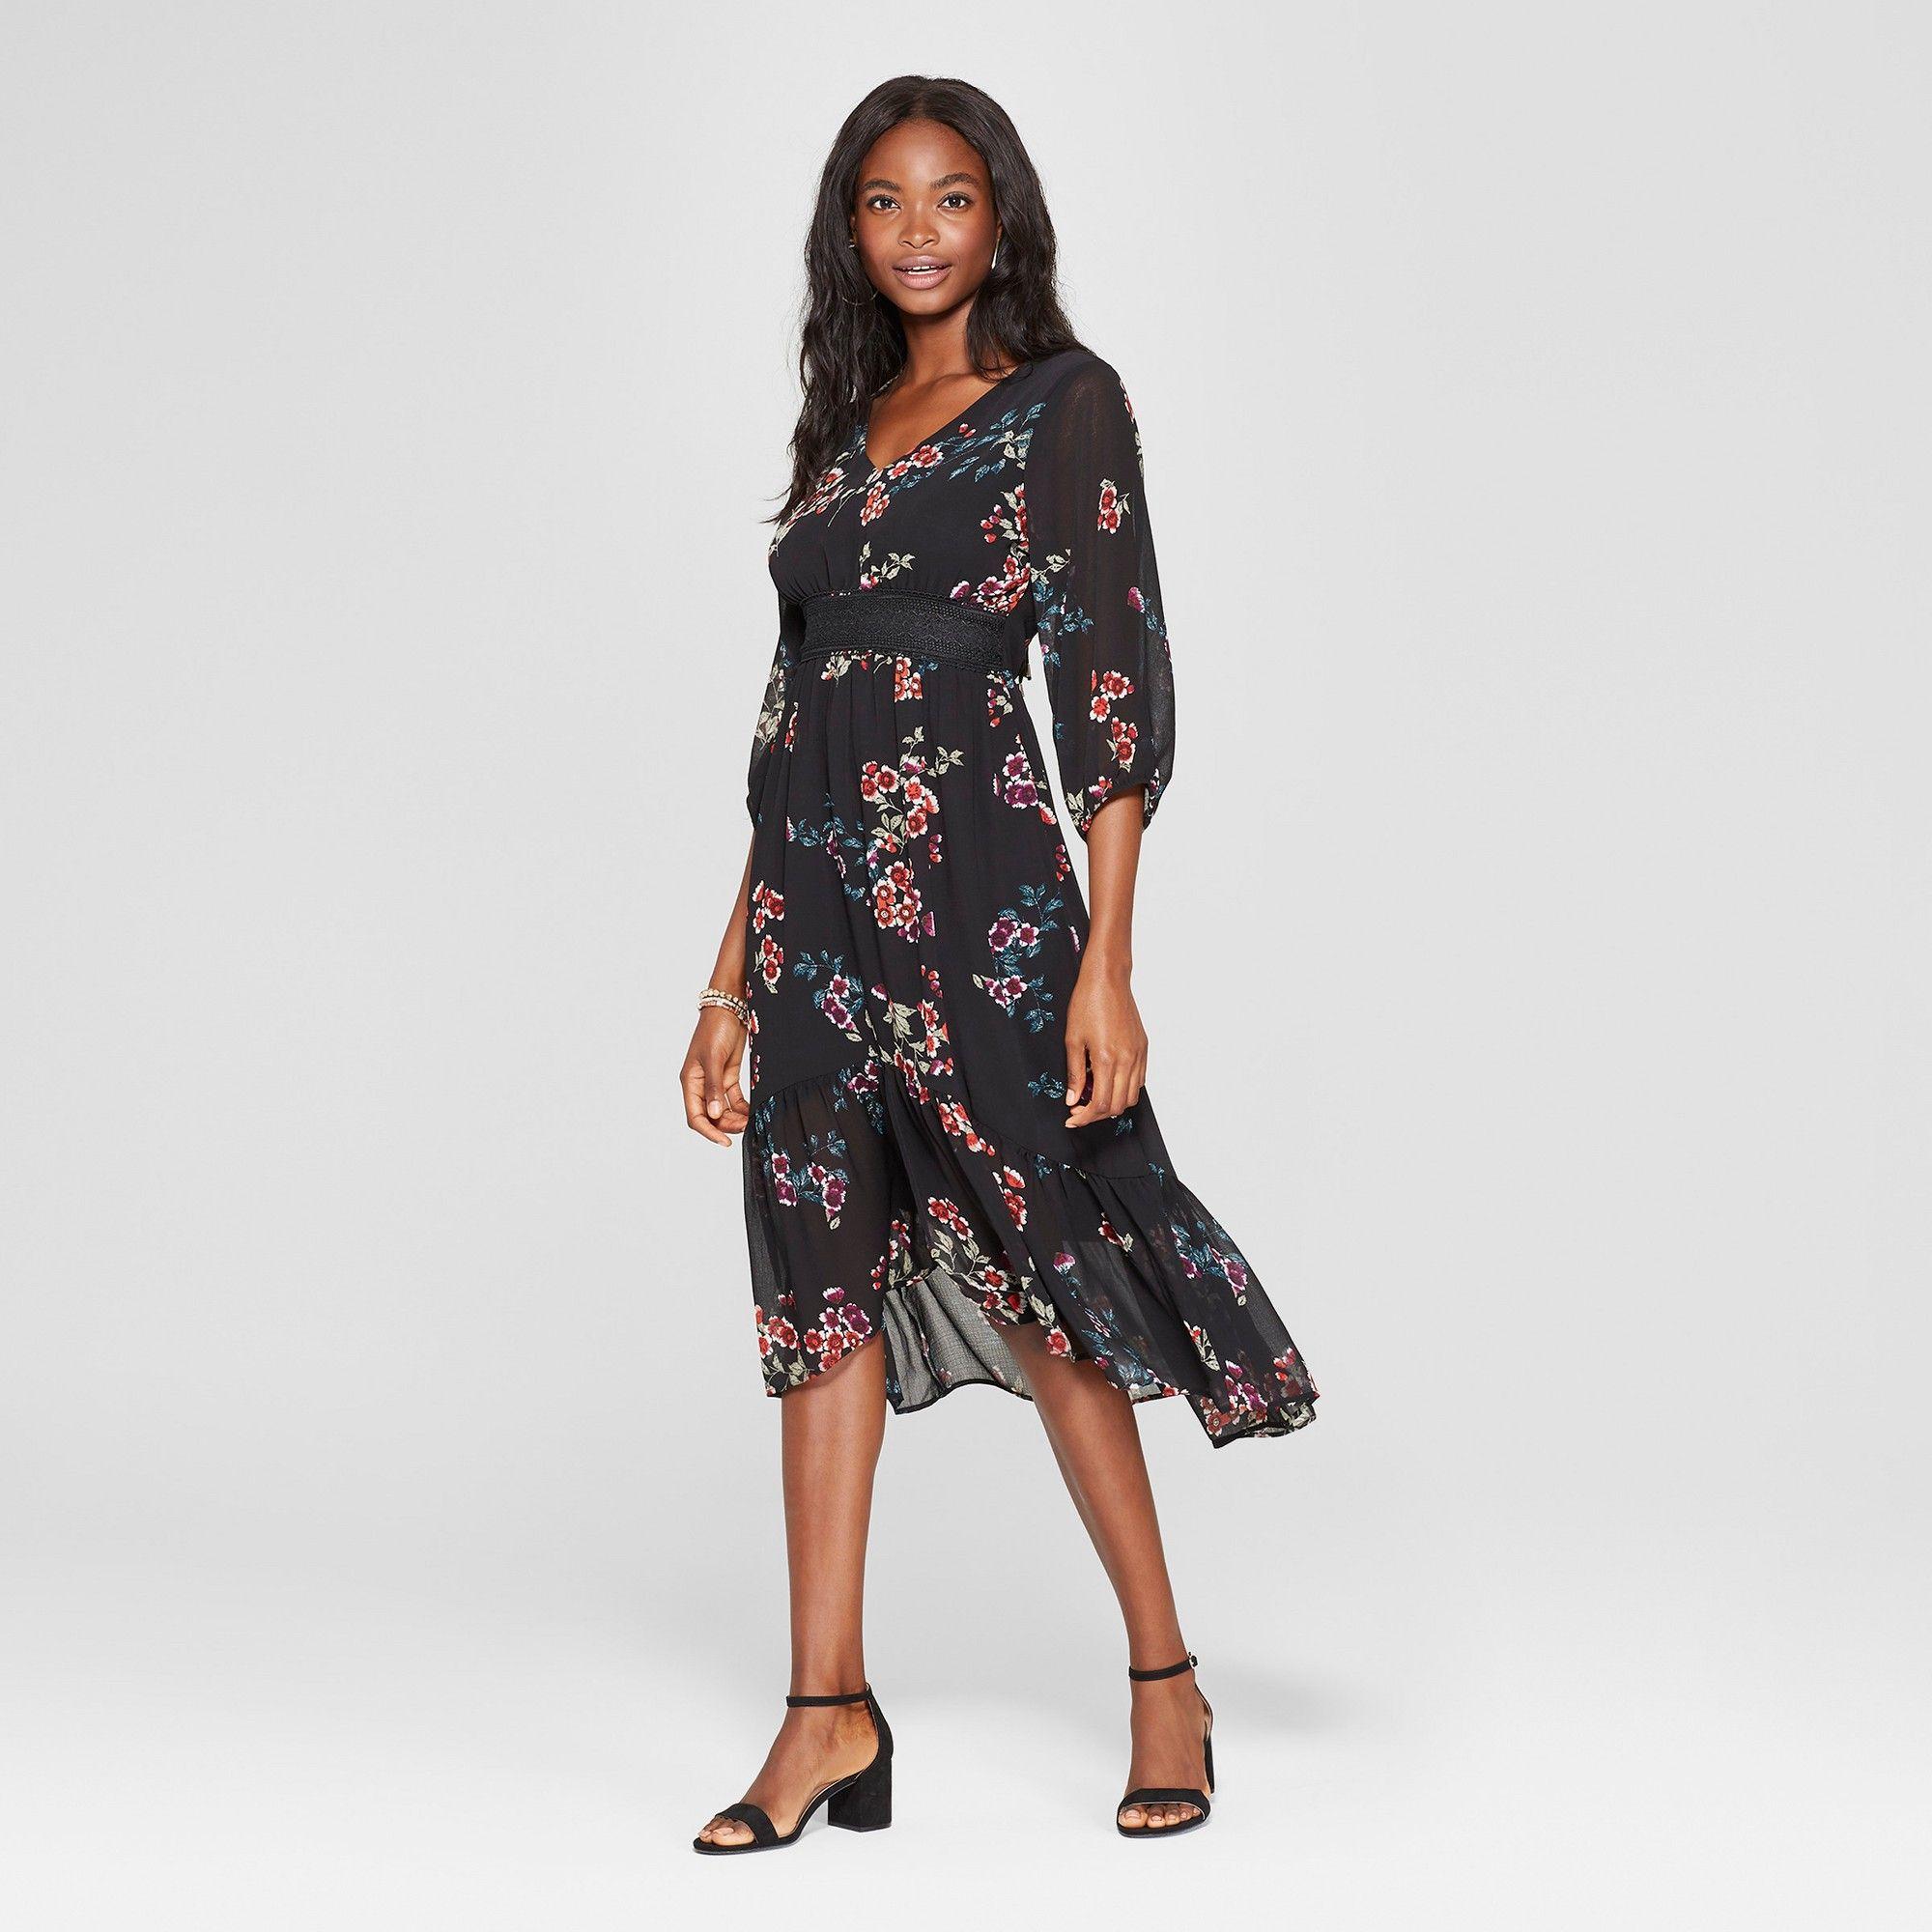 6a258dd386d Women s Floral Print Long Sleeve V-Neck Hi Low Hem Midi Dress - Xhilaration  Black Xxl